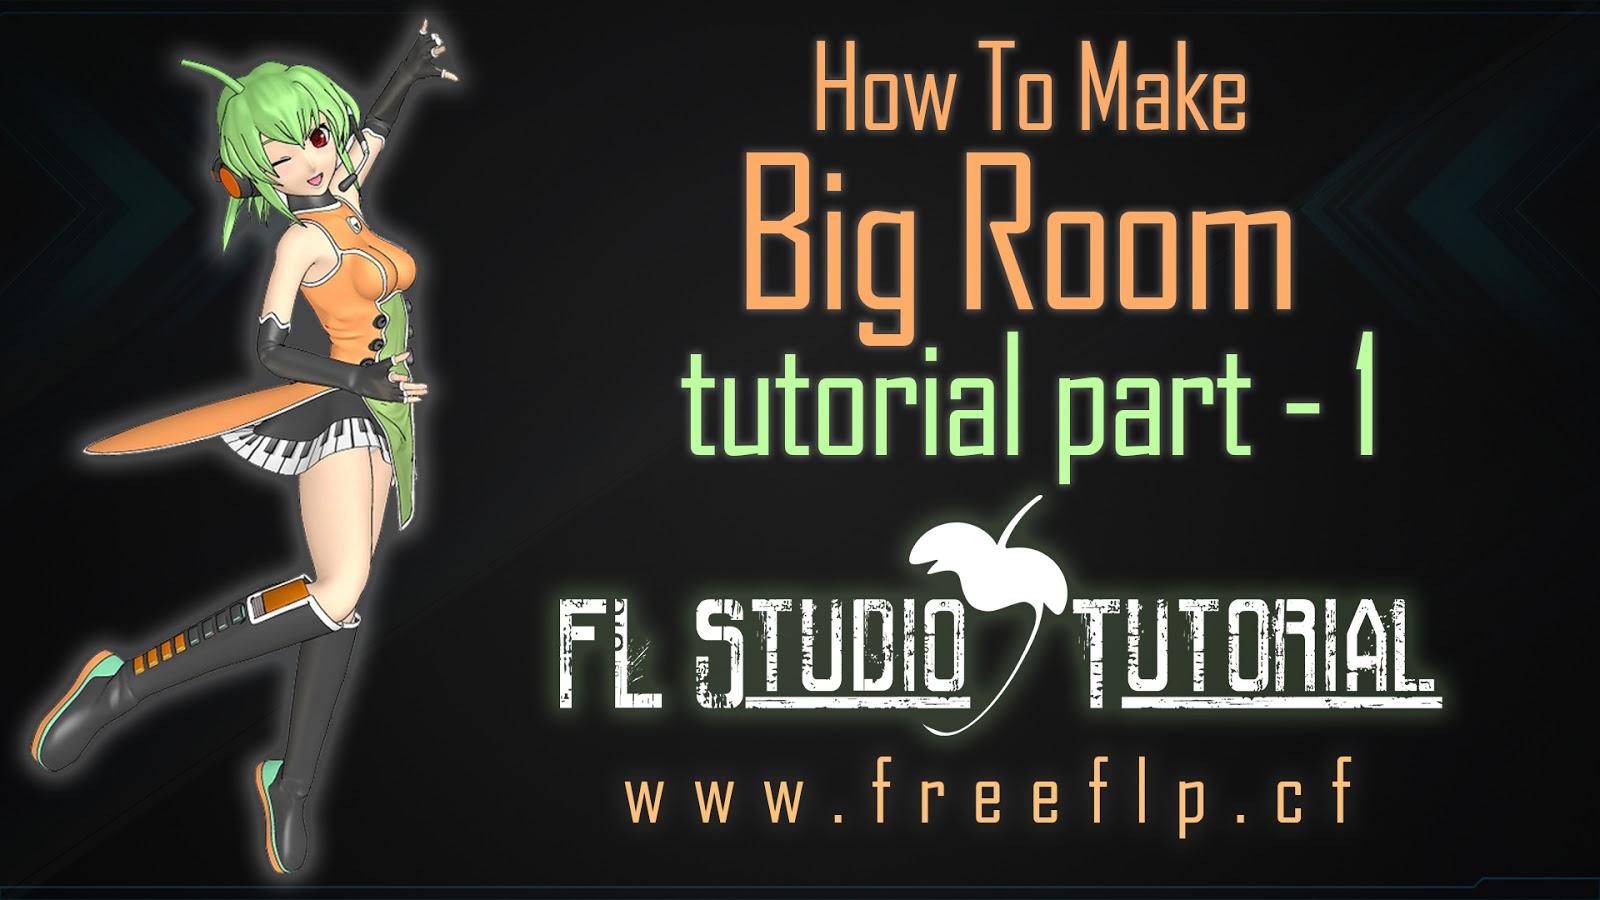 How to make big room tutorial part 1 fl studio for How to build a florida room